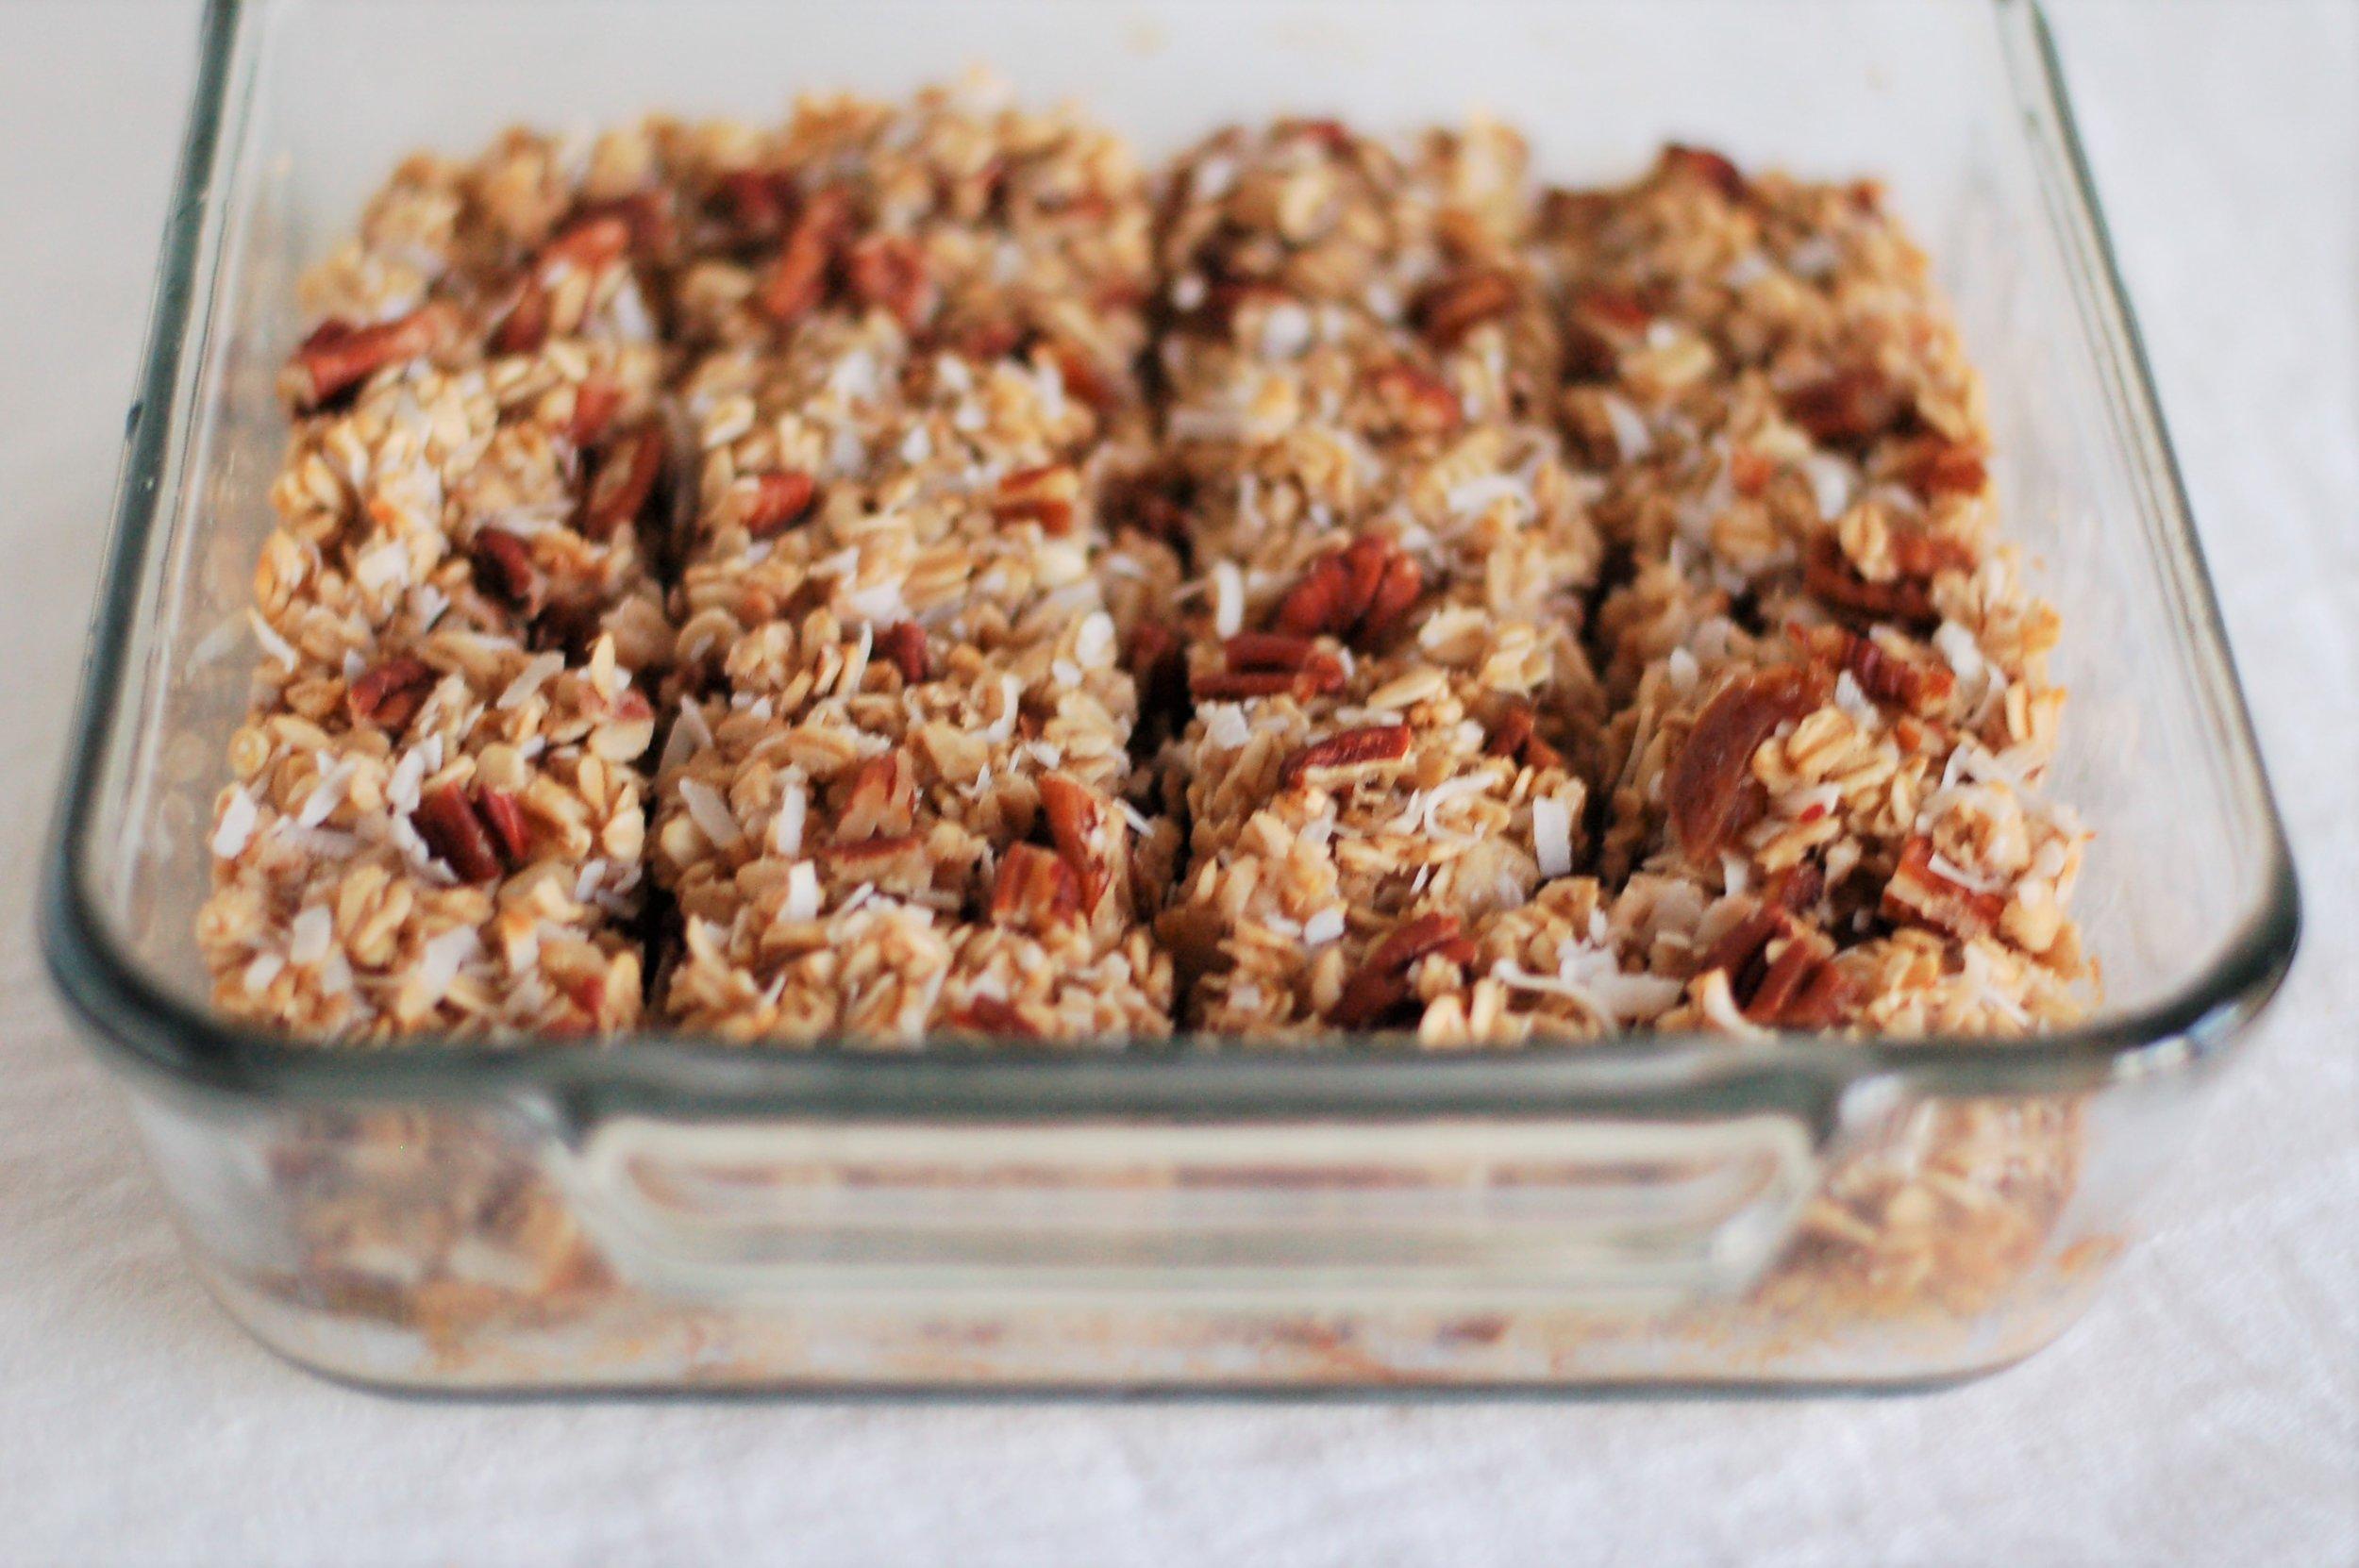 Date & Pecan Oatmeal Bake